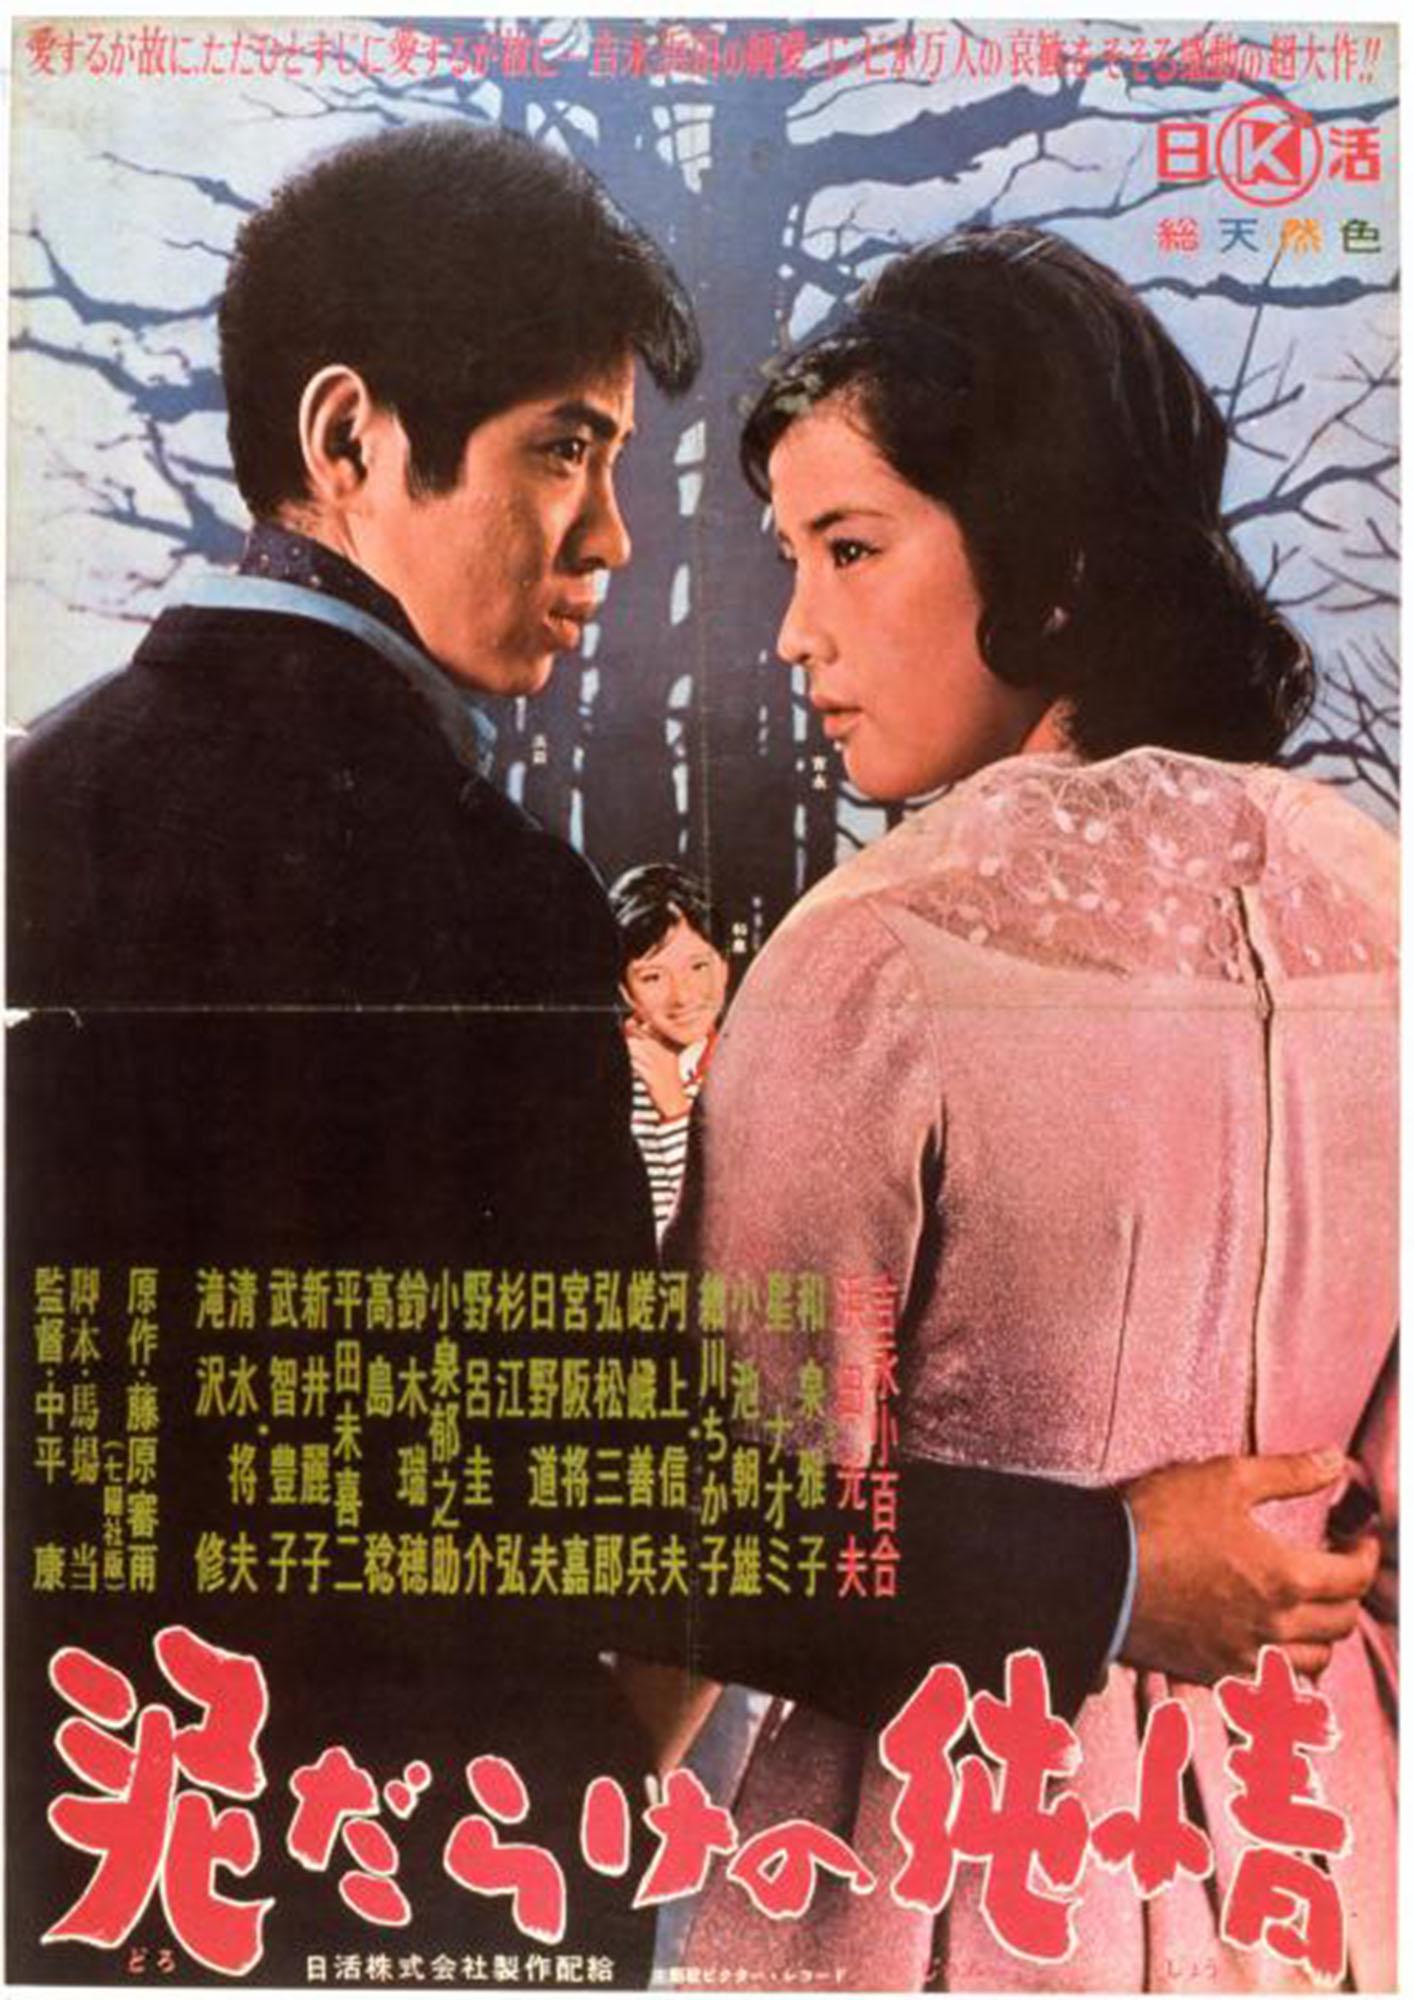 Cosmos Cinema 浜田光夫主演「泥だらけの純情」